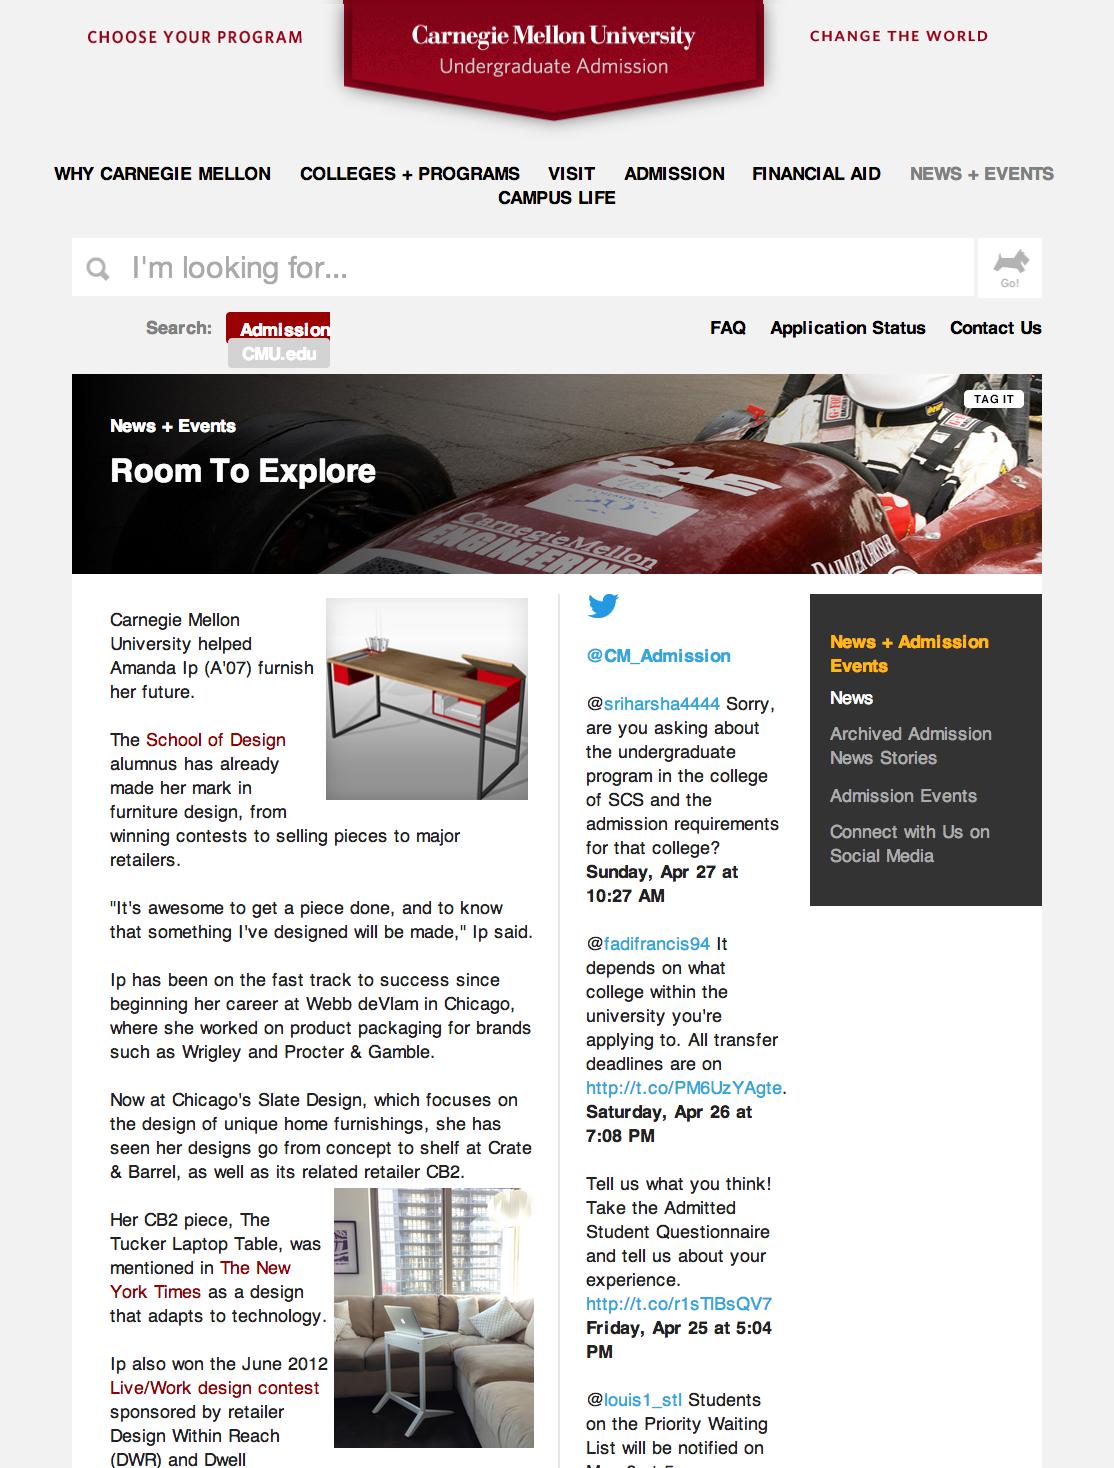 Carnegie Mellon University: Room to Explore